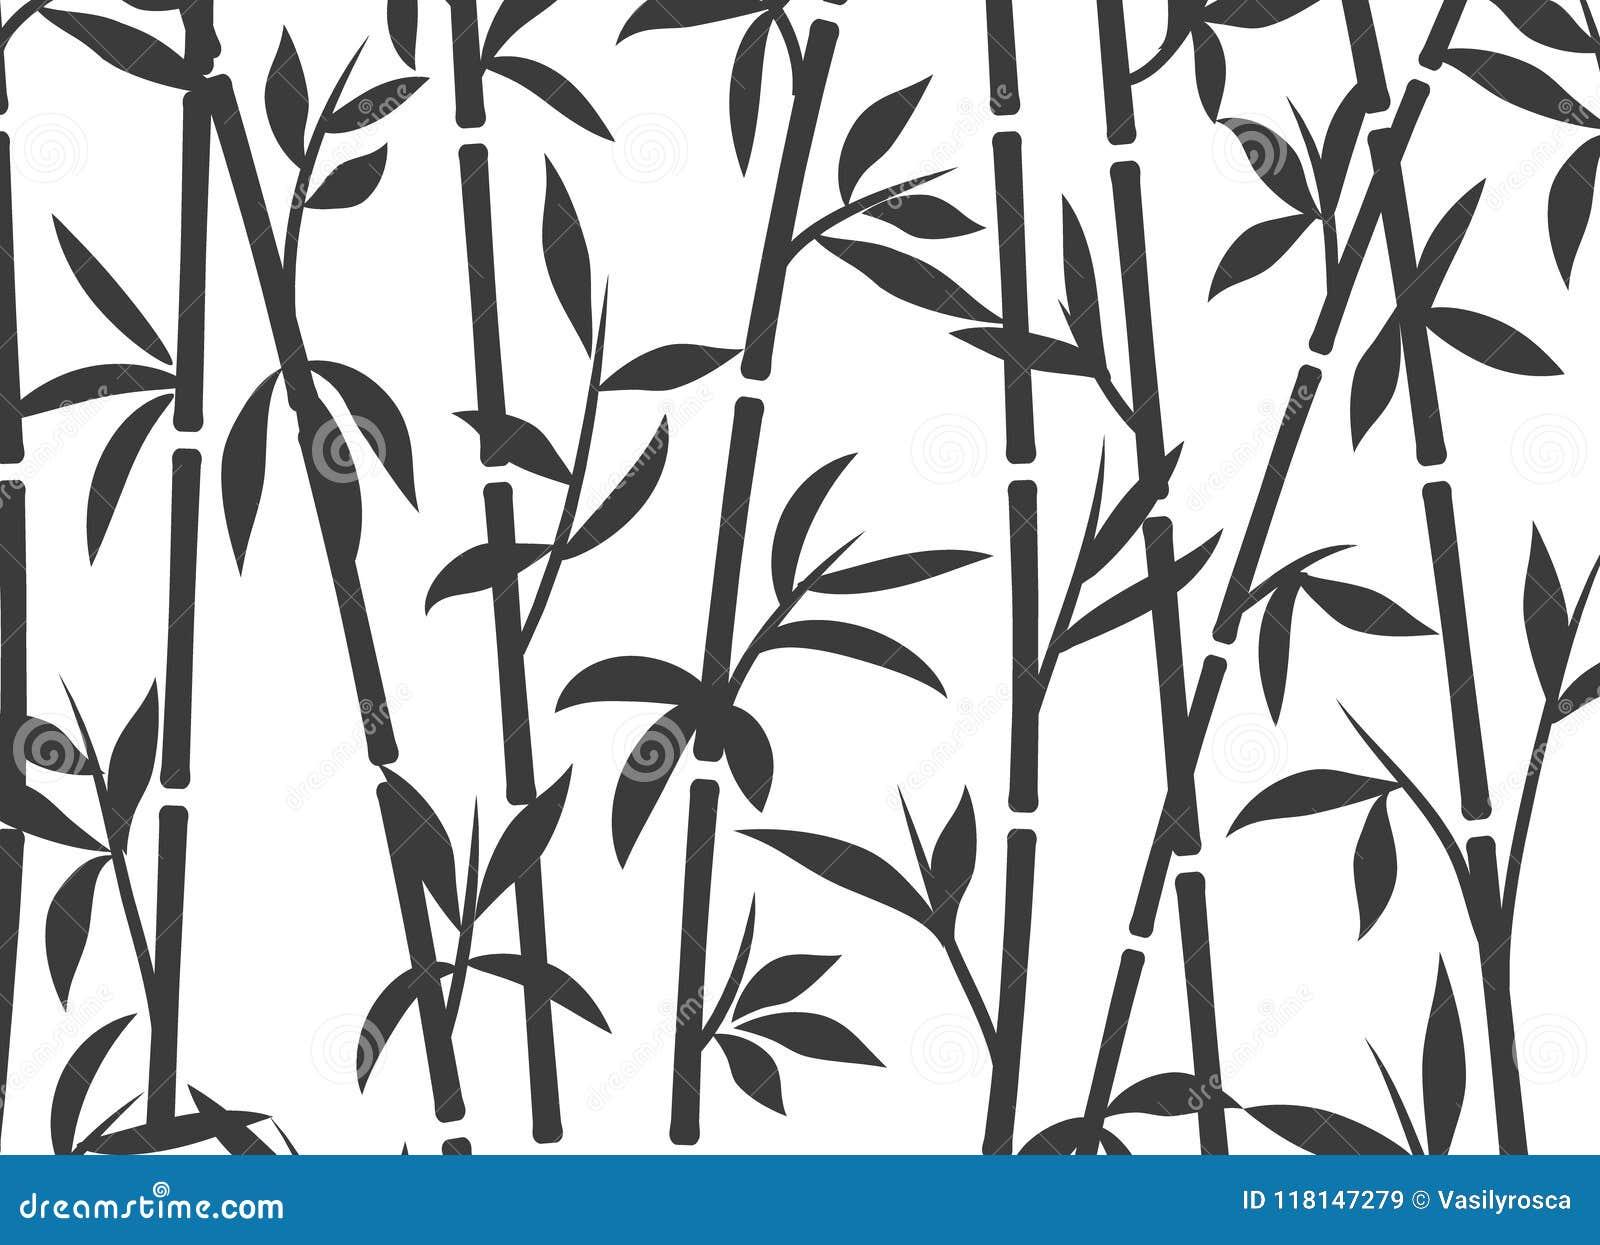 Bamboo Illustration Png